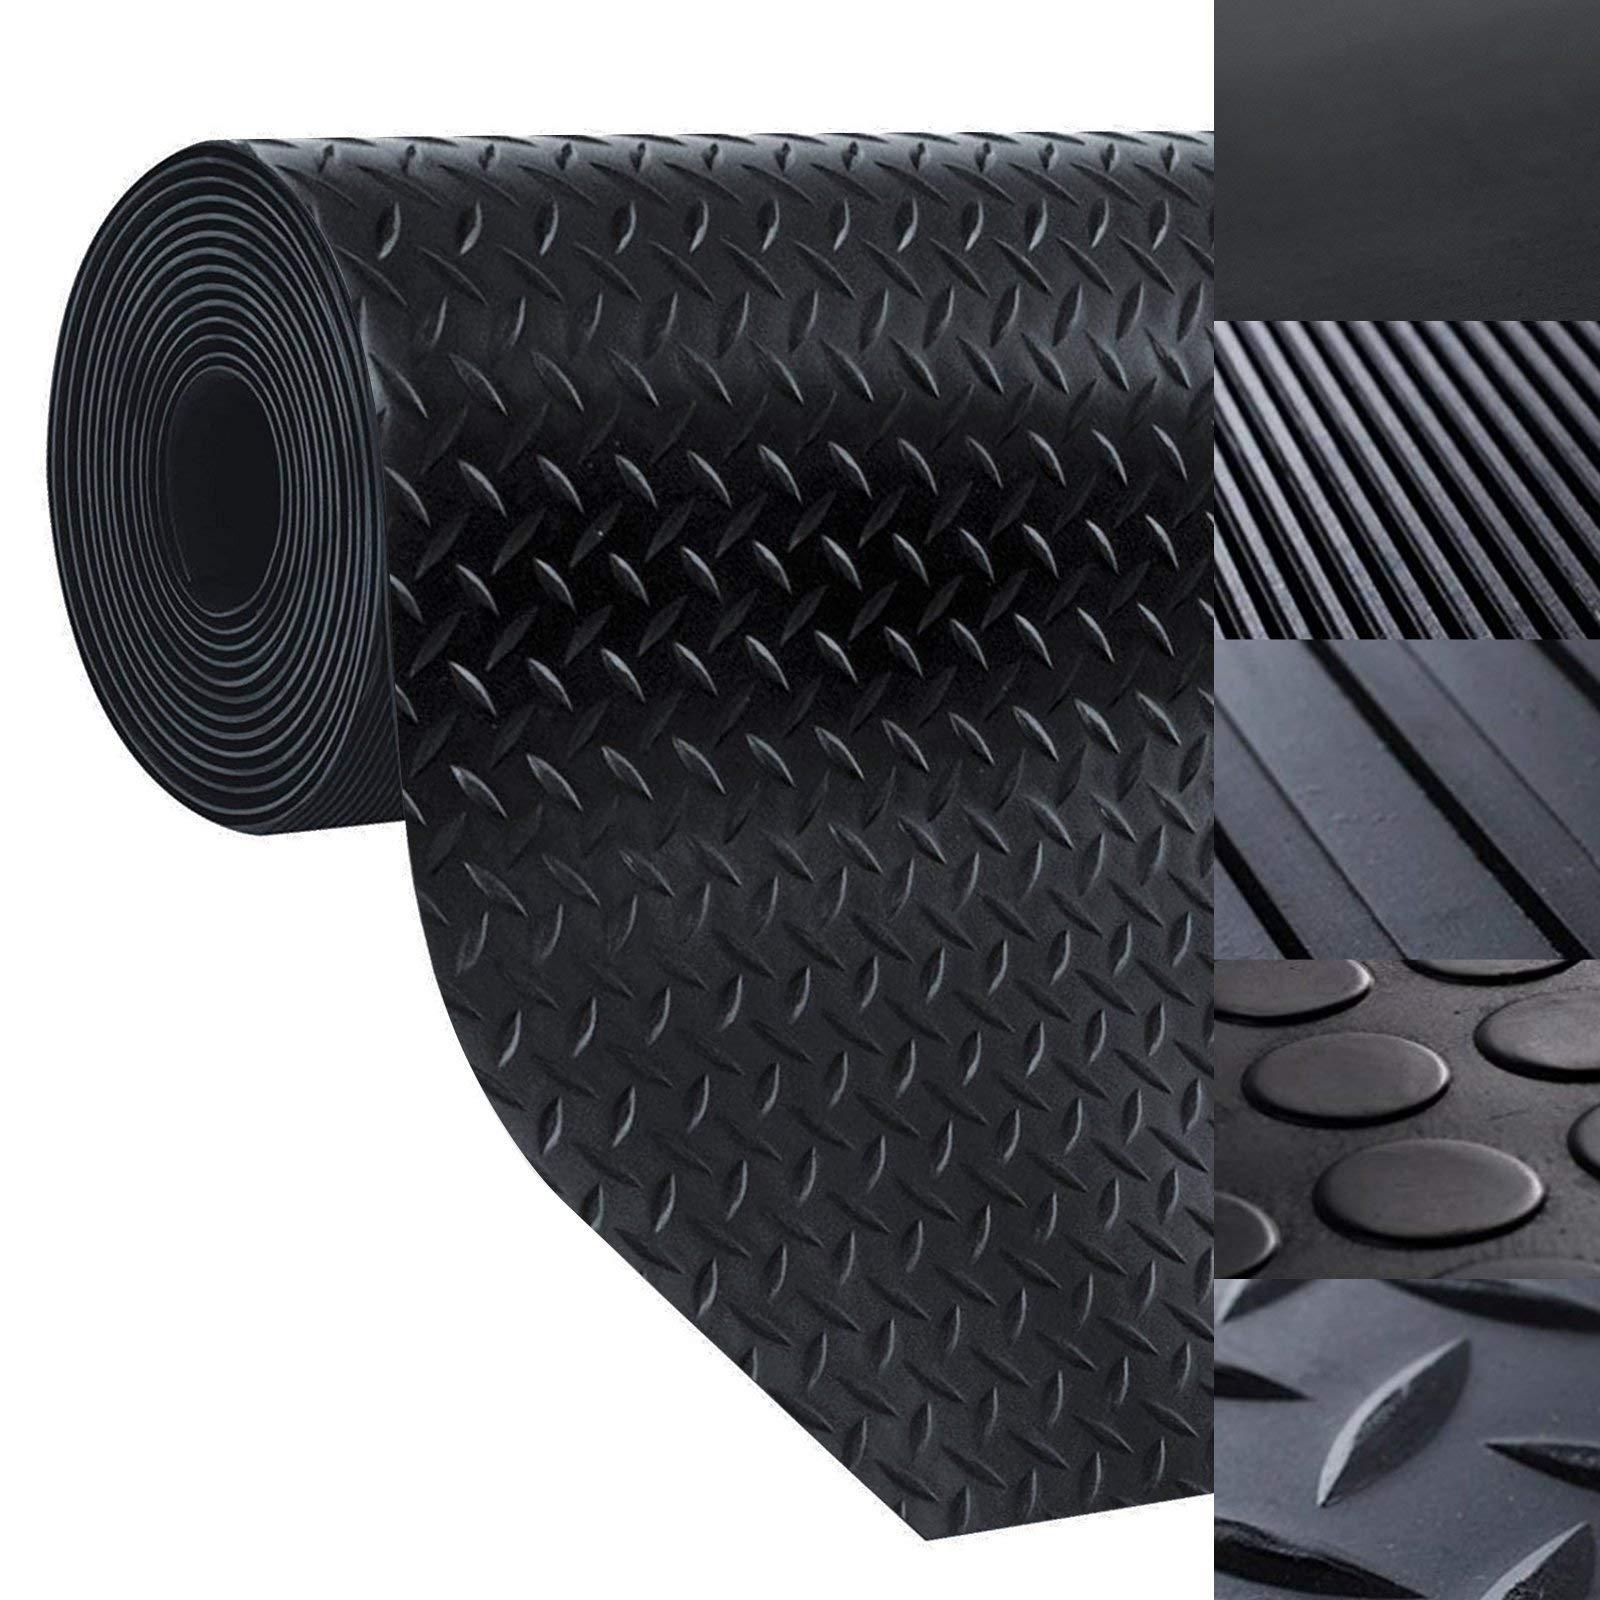 casa pura Rubber Floor Mat – Anti Slip Rubber Sheet | Suitable as Garage Floor Mat, Horse Stall Mat or Workbench Mat | Many Sizes to Choose from | Diamond | 1/8'' Thick - 40'' x 1'